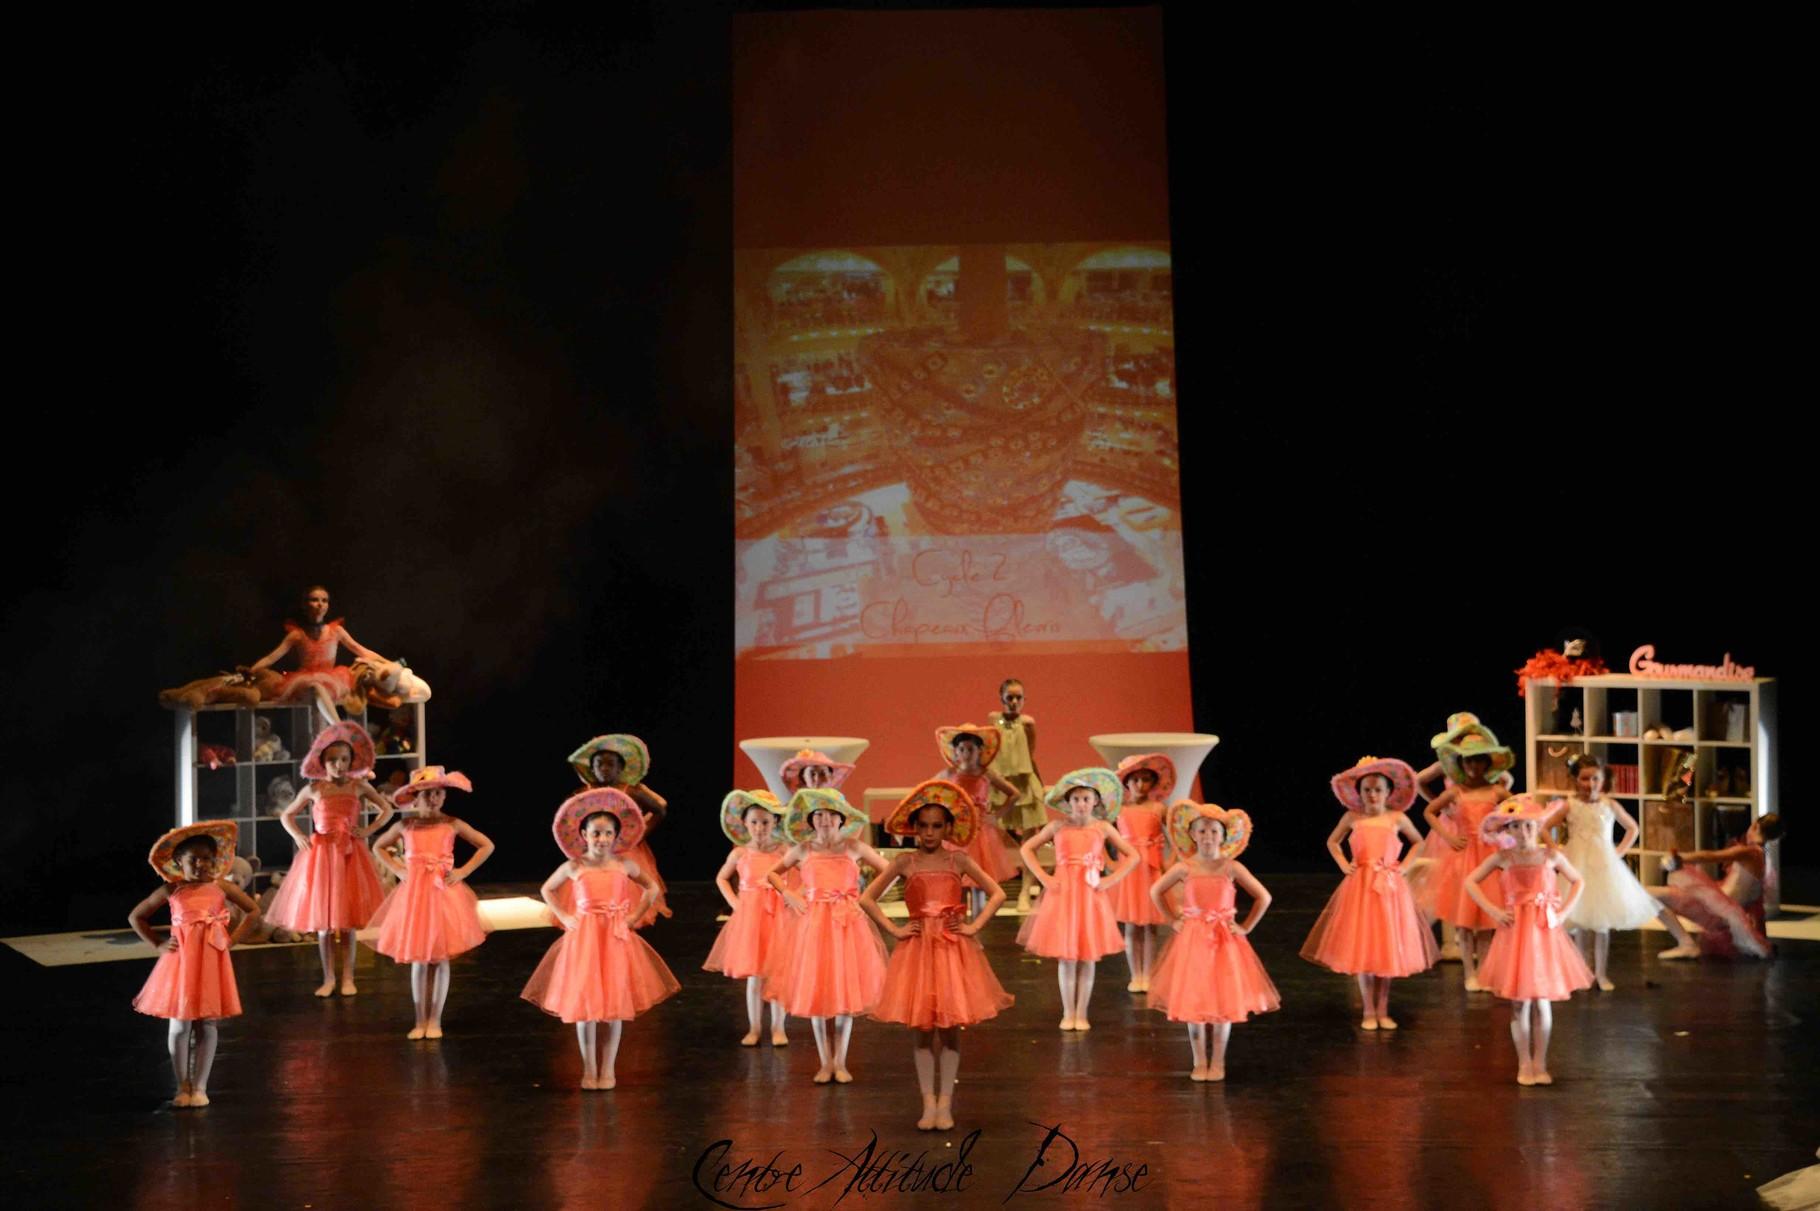 Gala Attitude Danse Reims